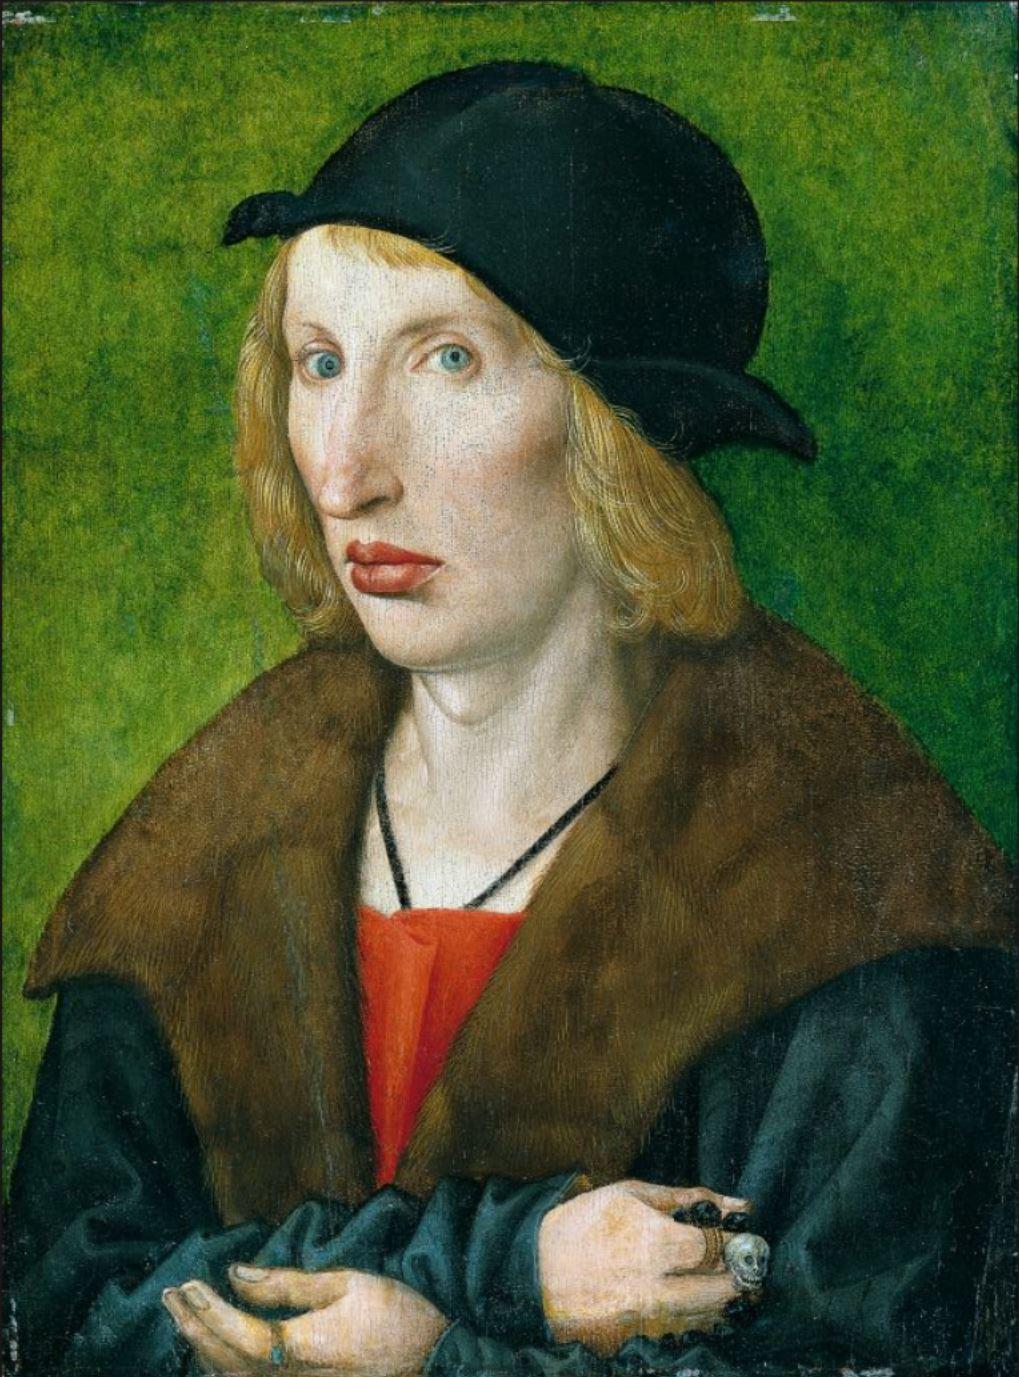 Wolf Traut 1501 Portret van Hans Gyger Staedel Museum, Frankfurt am Main